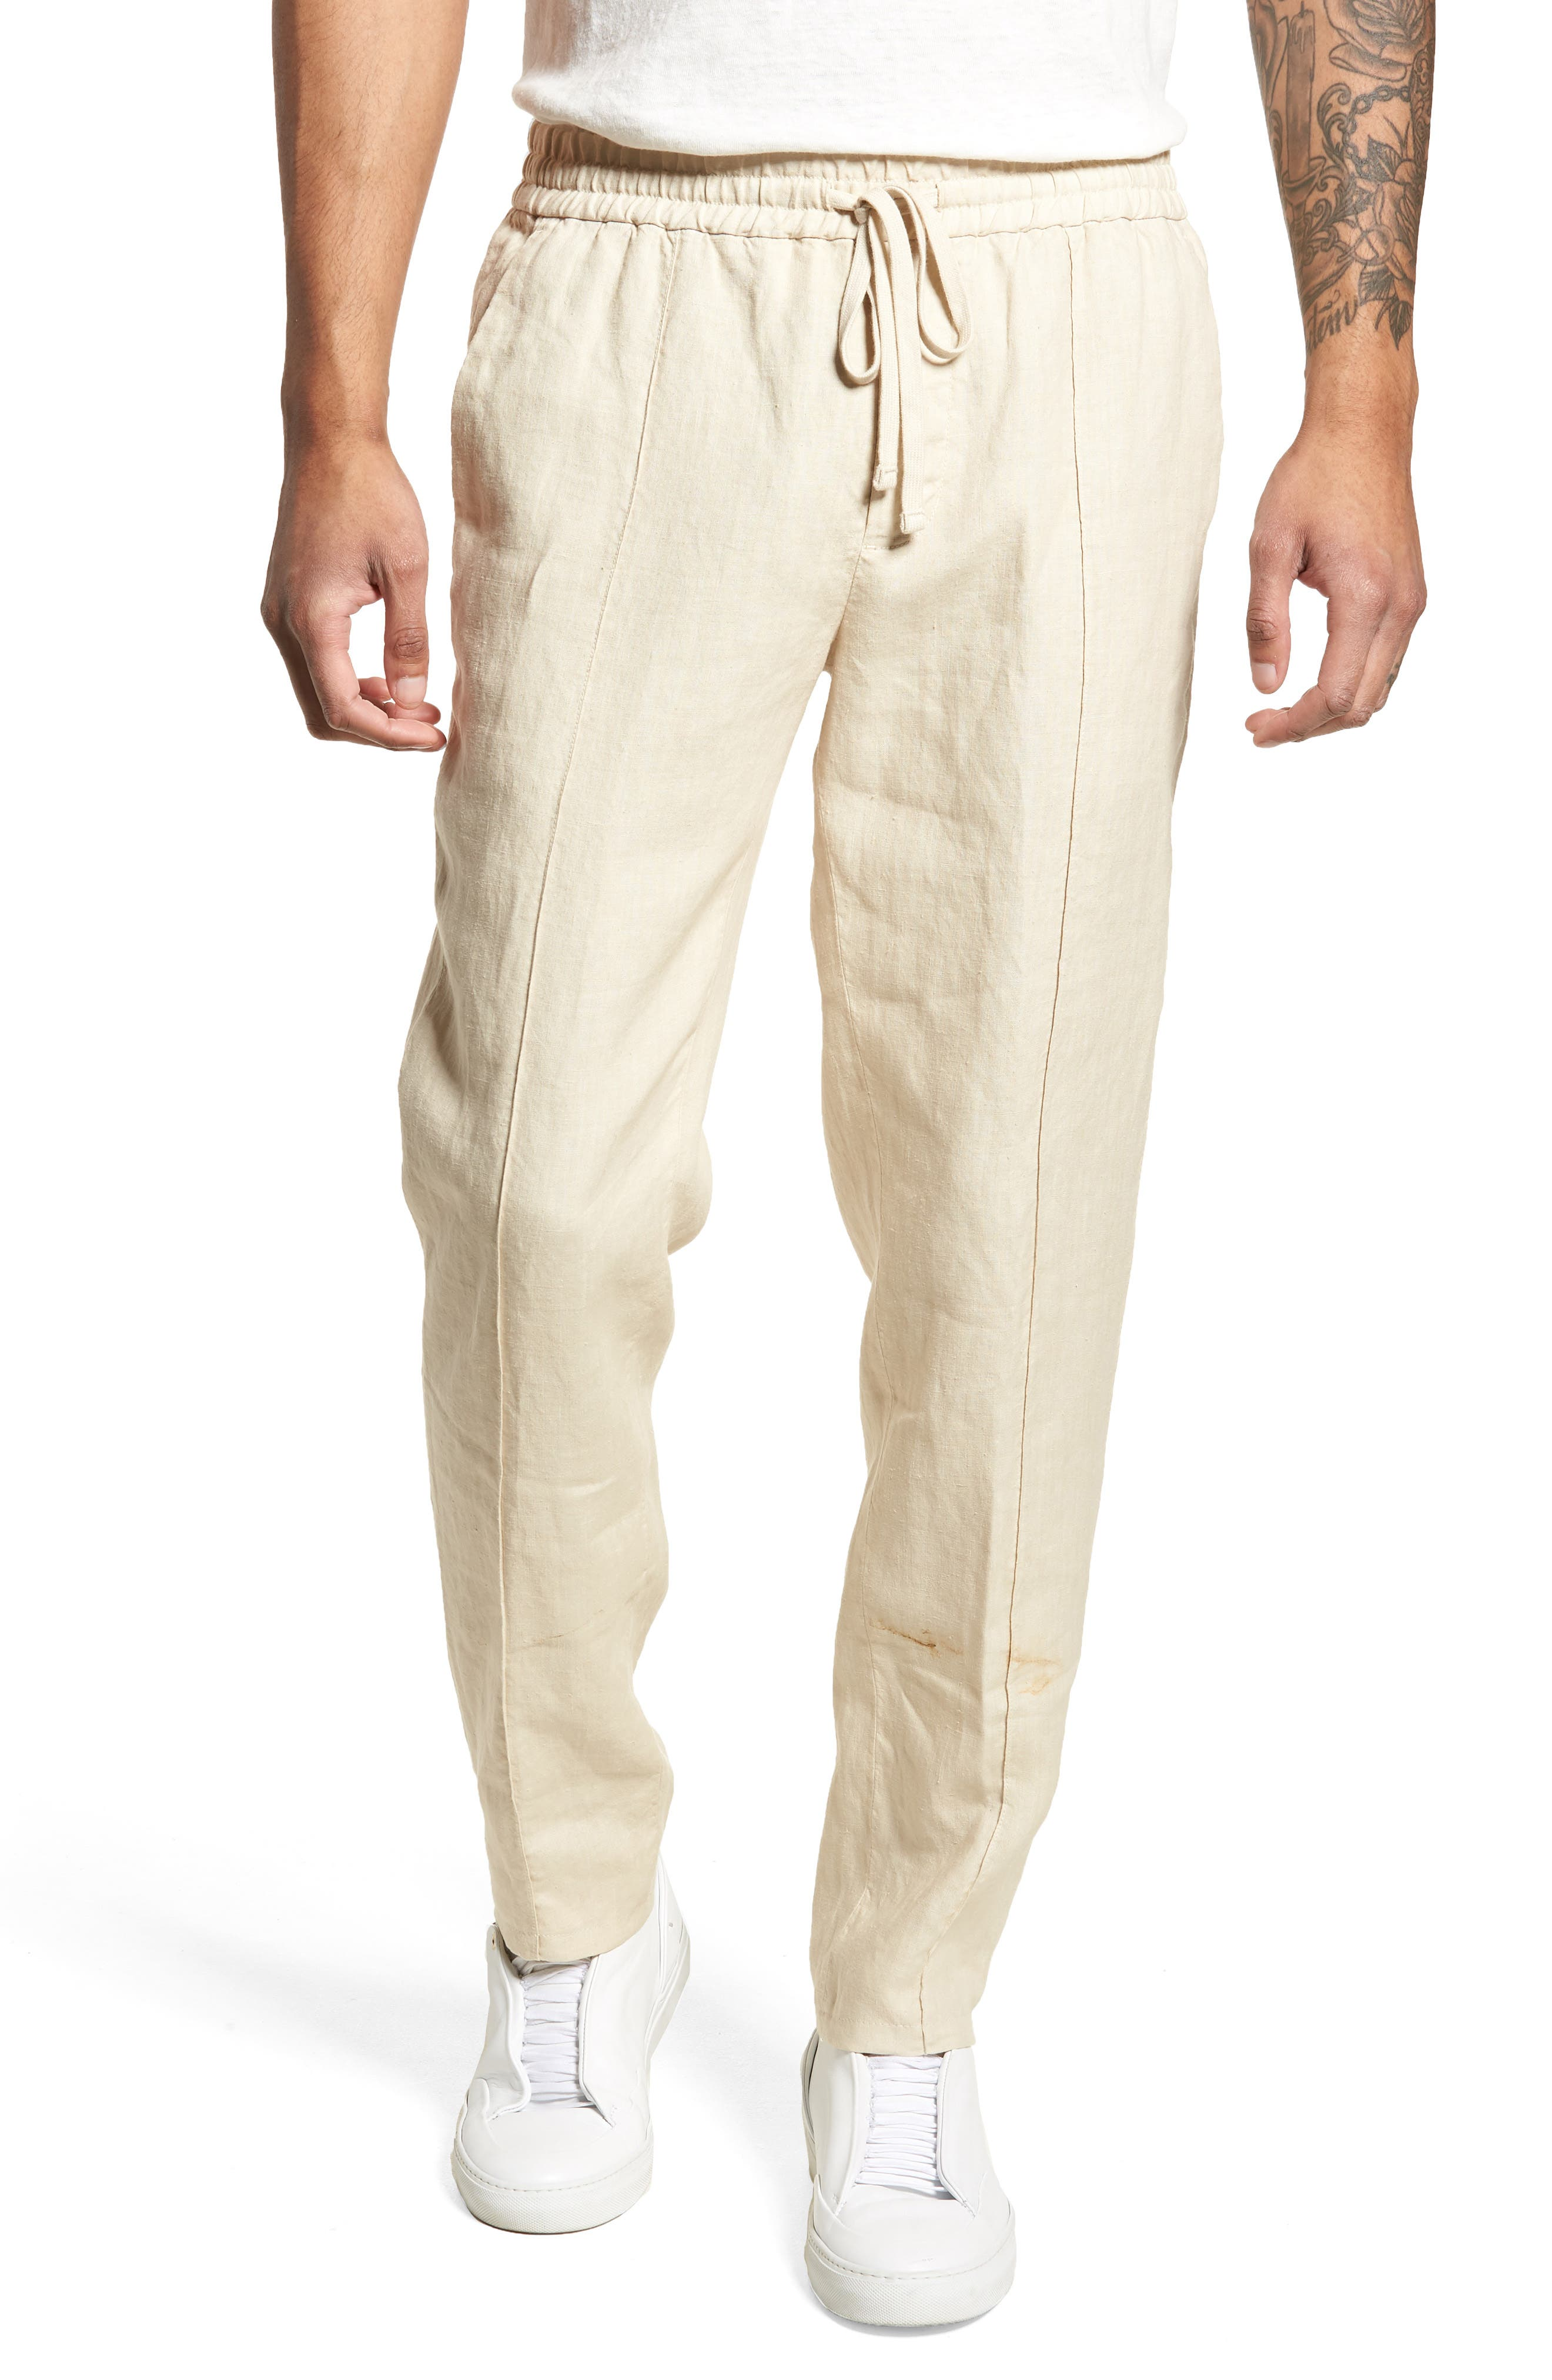 Pintuck Slim Fit Hemp Track Pants,                             Main thumbnail 1, color,                             250